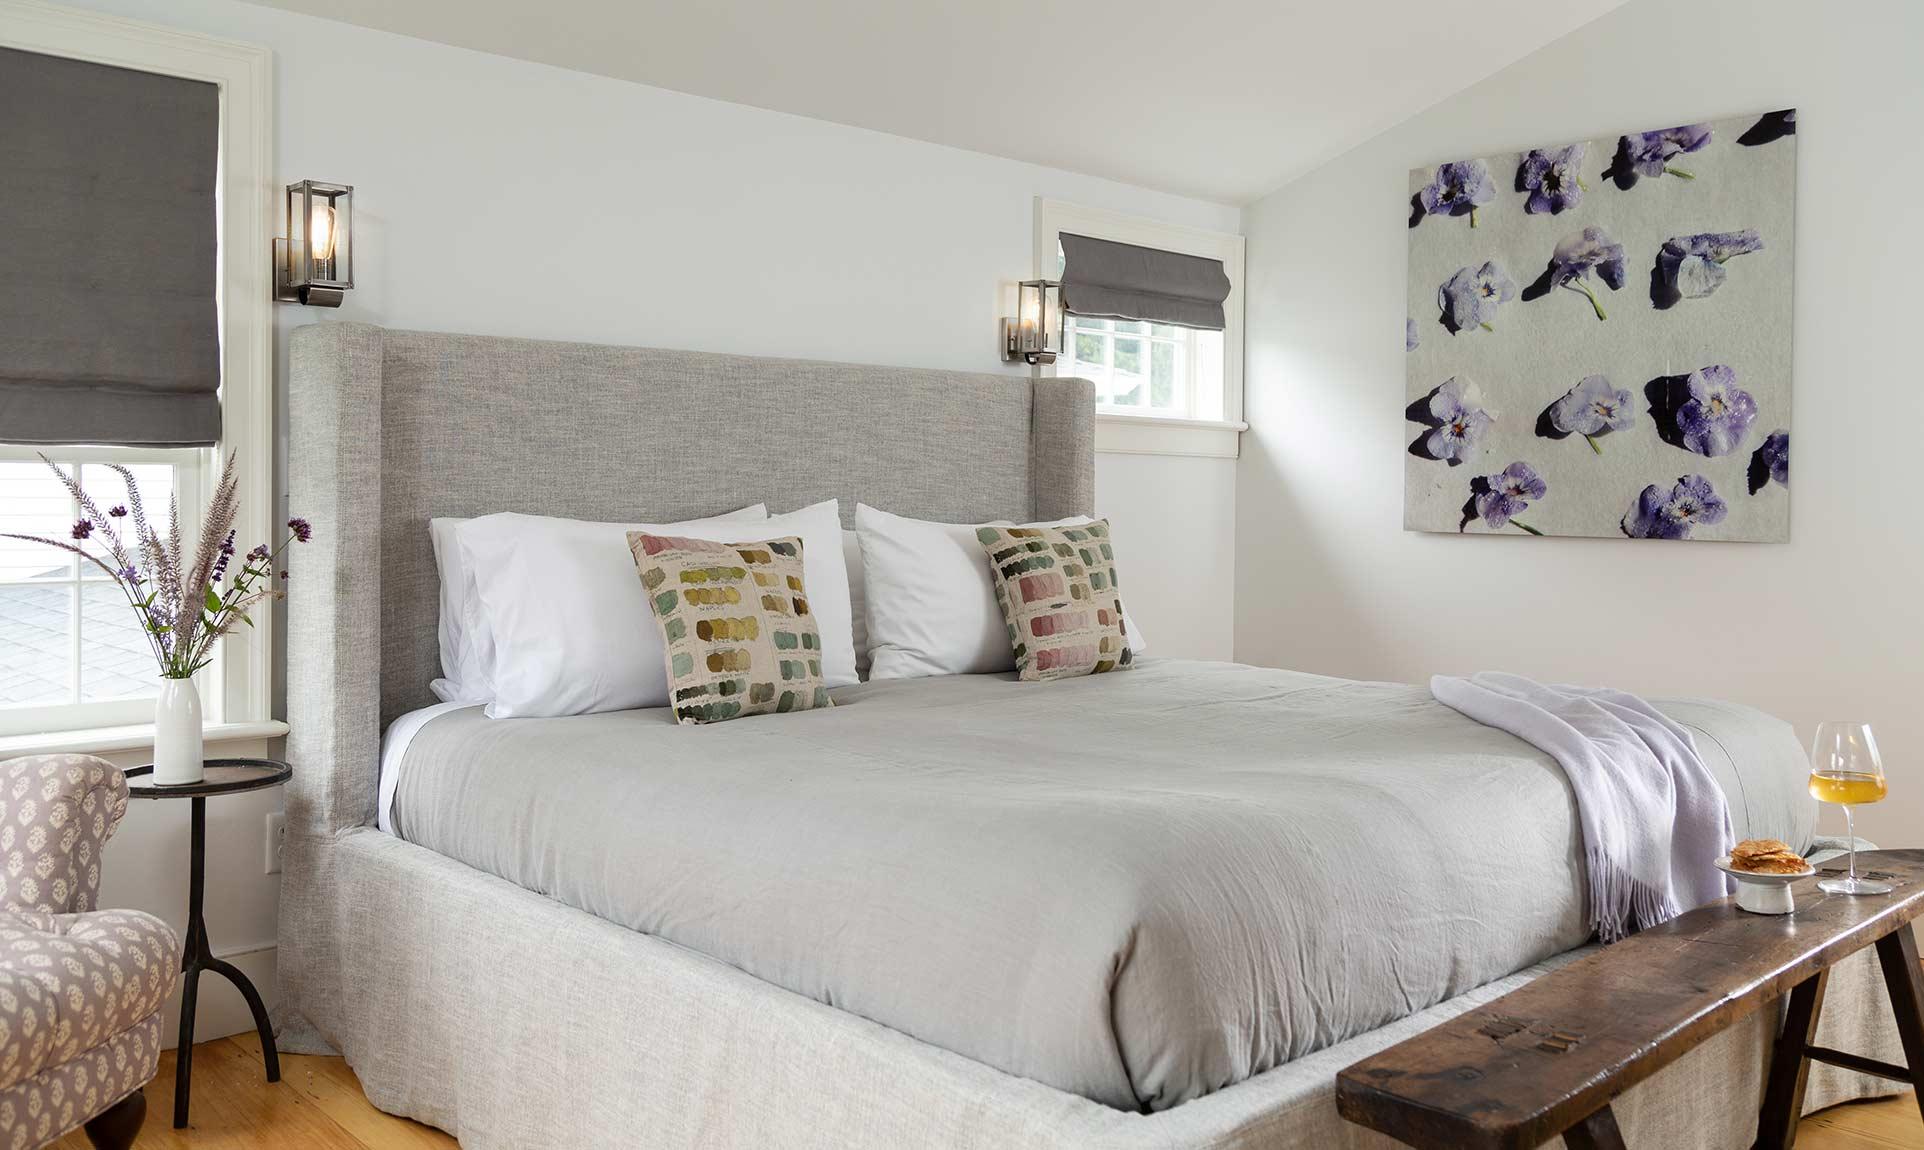 Locke Room Bed